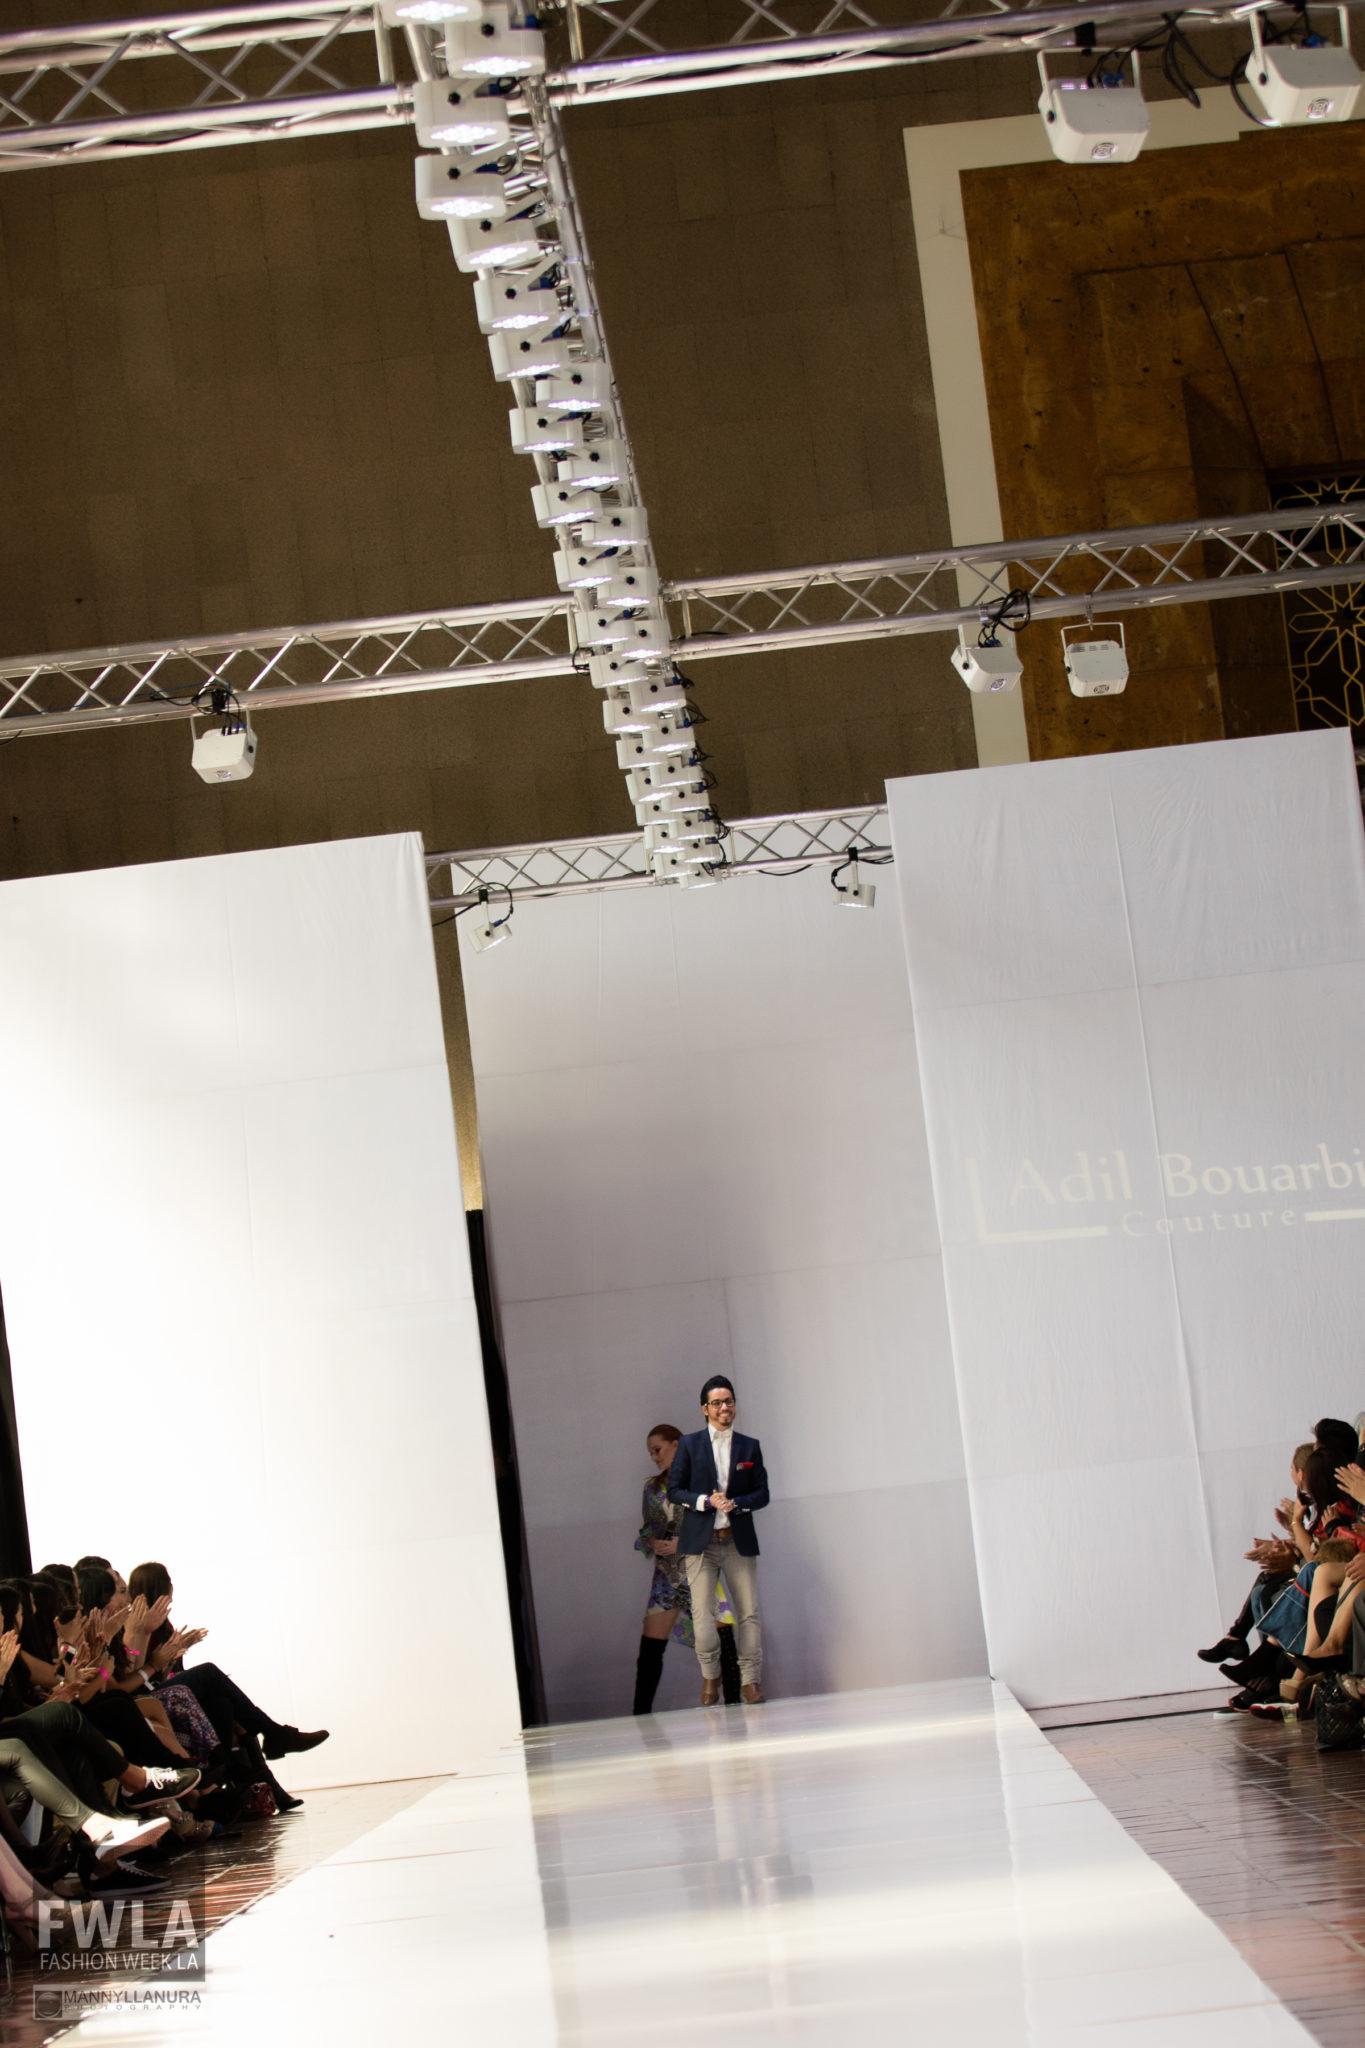 Adil Bouarbi Designer Runway FWLA 2016